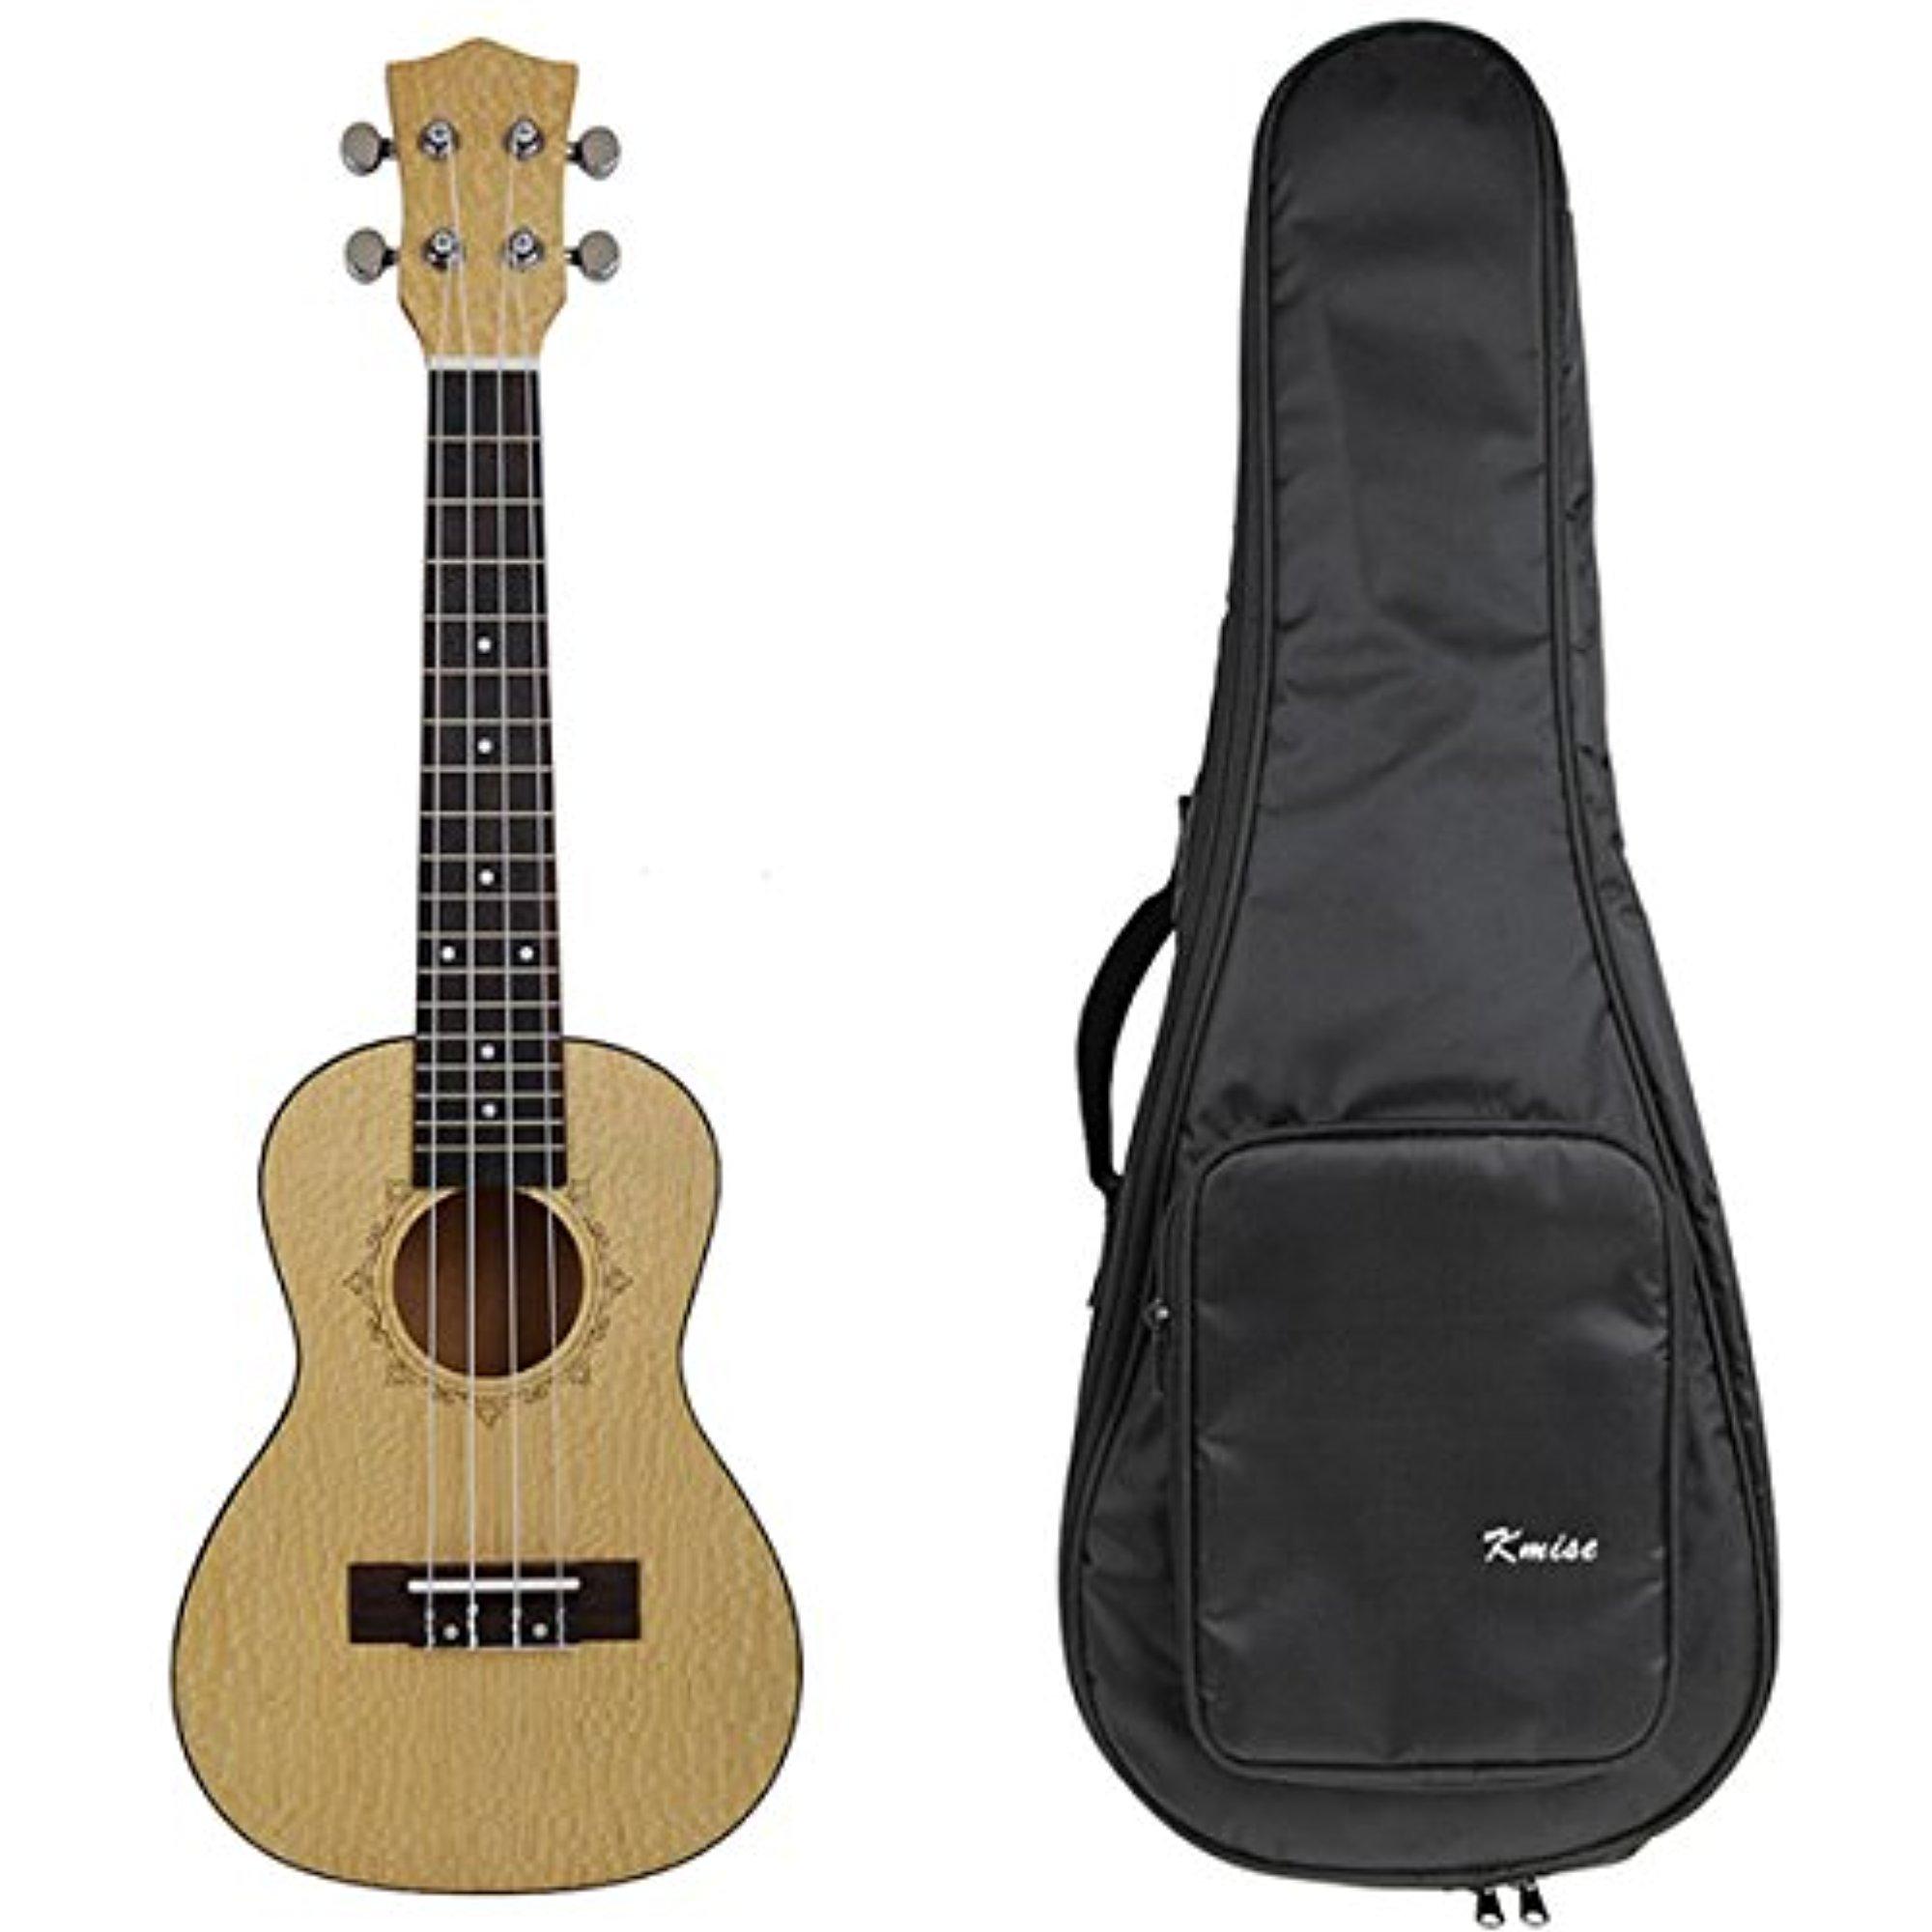 Kmise Professional 23 Inch Concert Ukulele Uke Hawaii Guitar Pearl Wood 18 Fret W Bag by Kmise